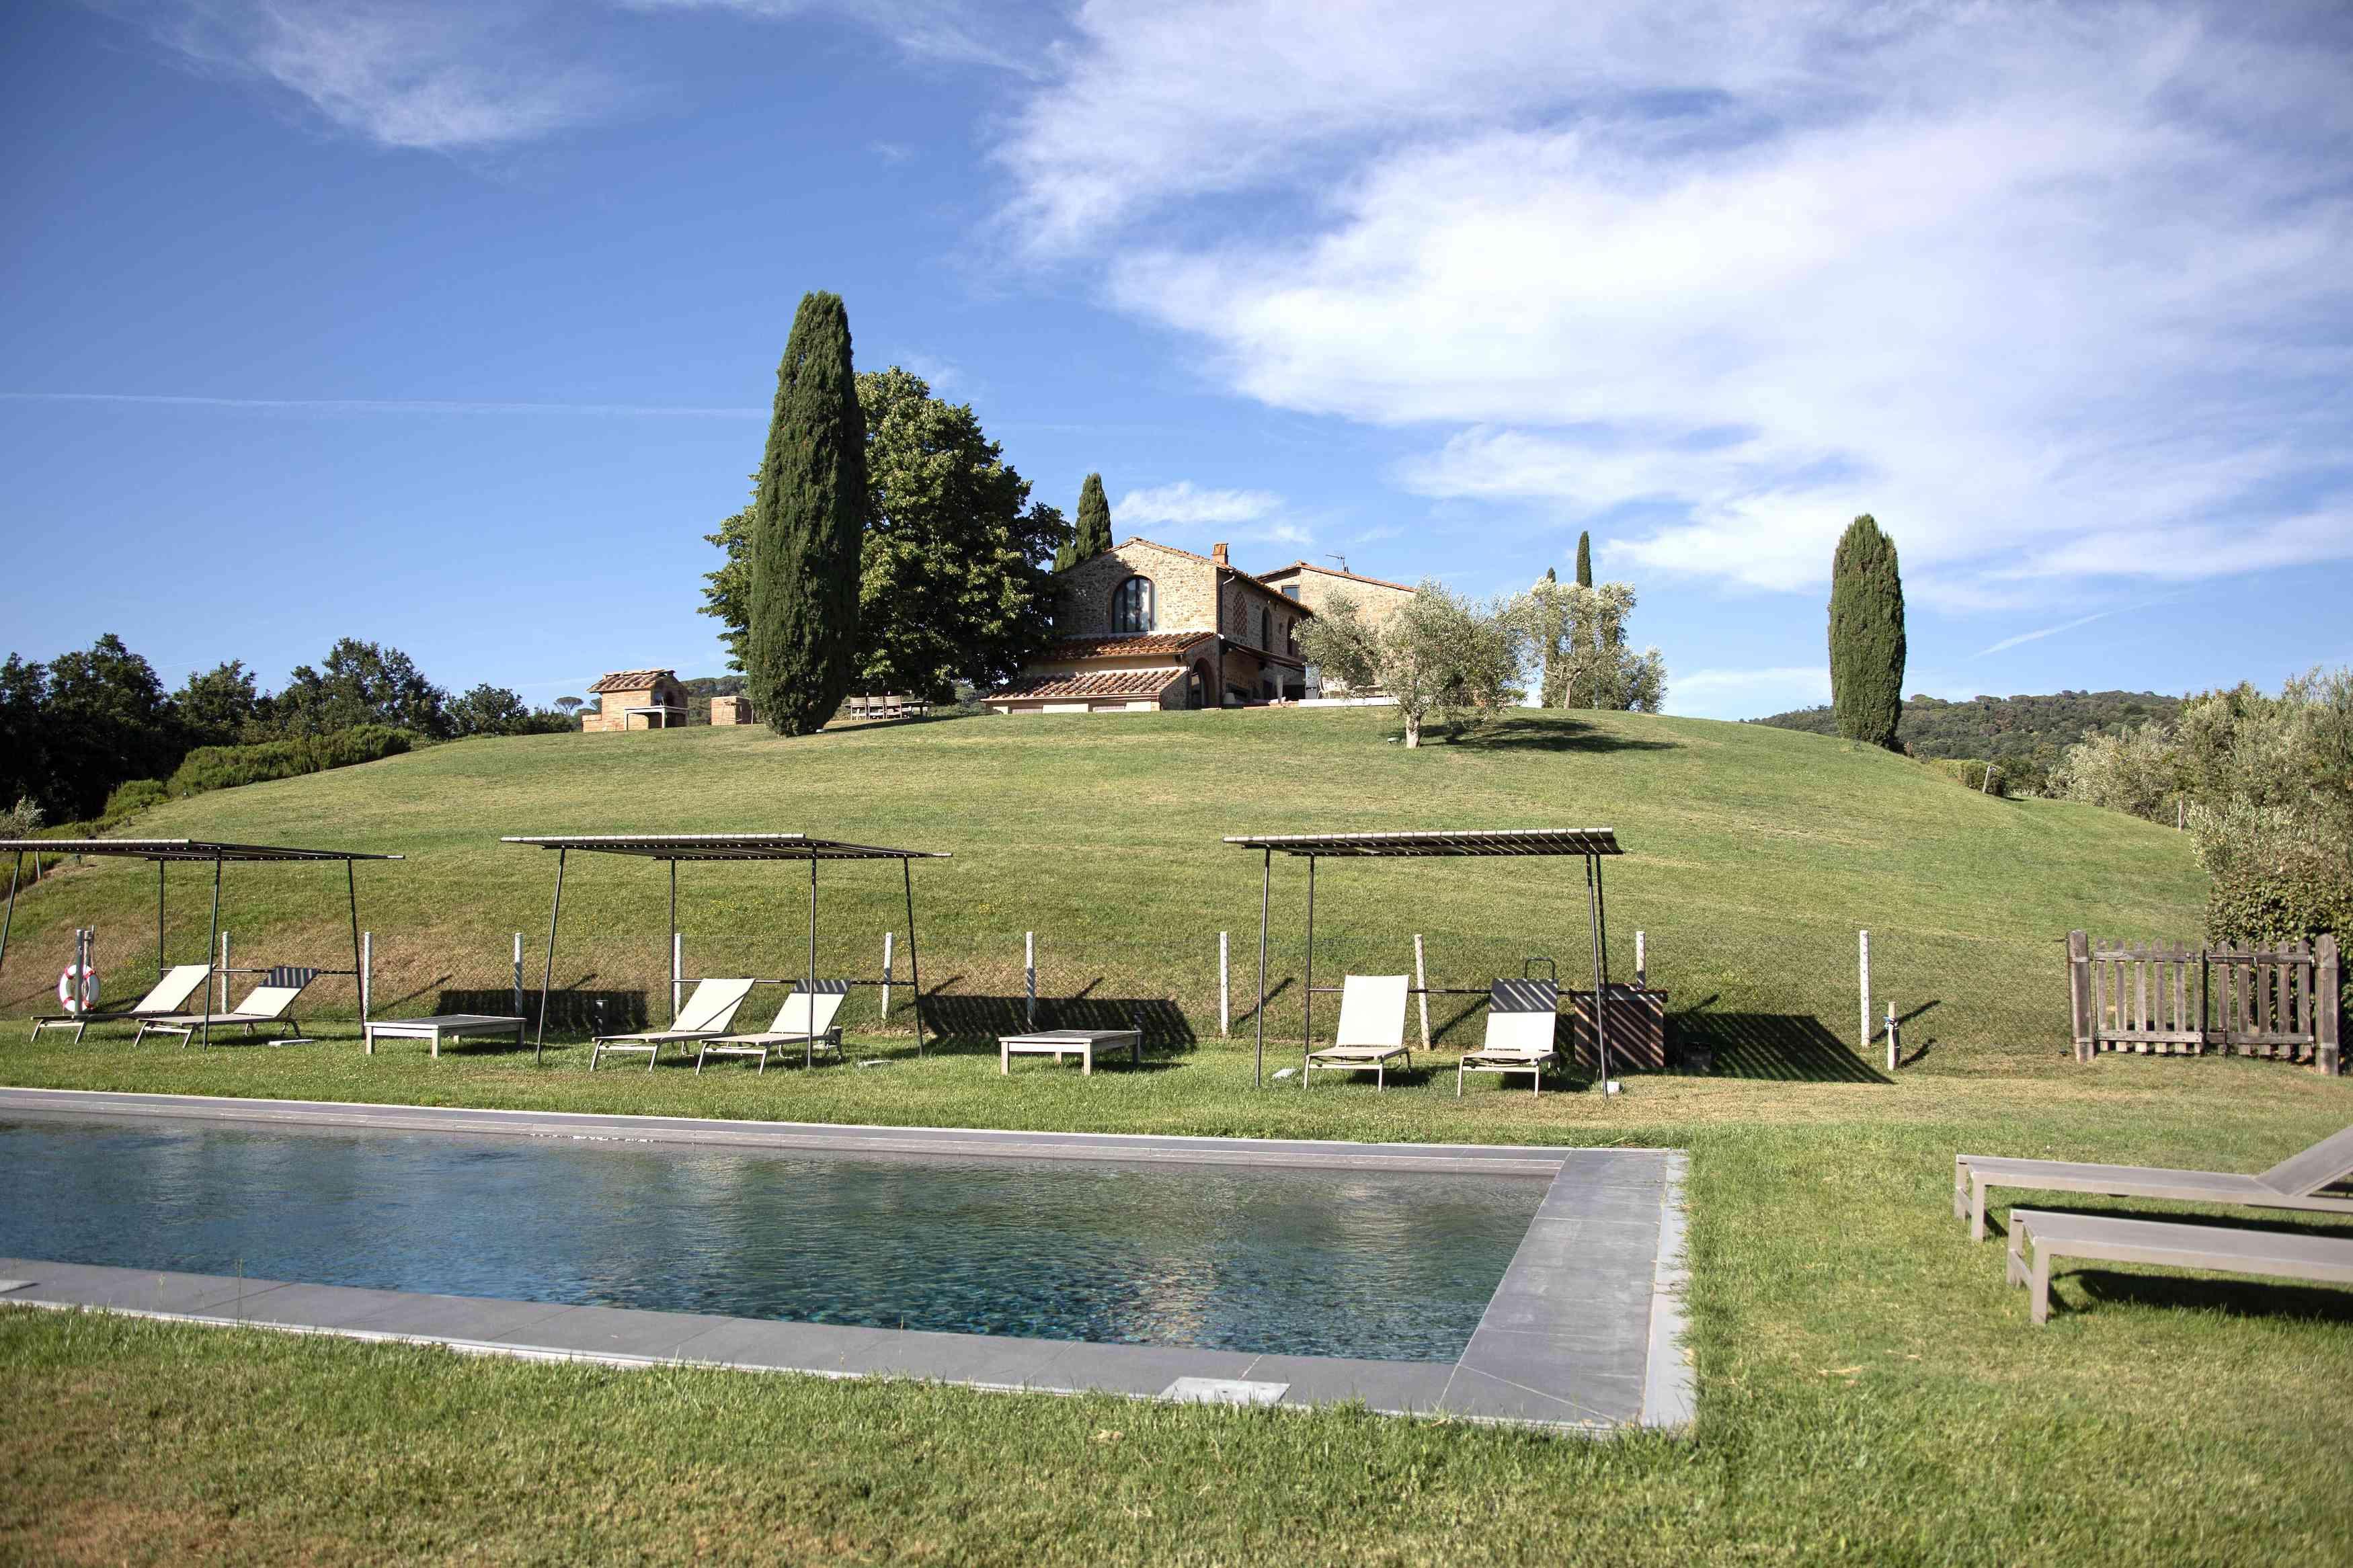 Pool and cabanas at Agriturismo Caseta in Tuscany